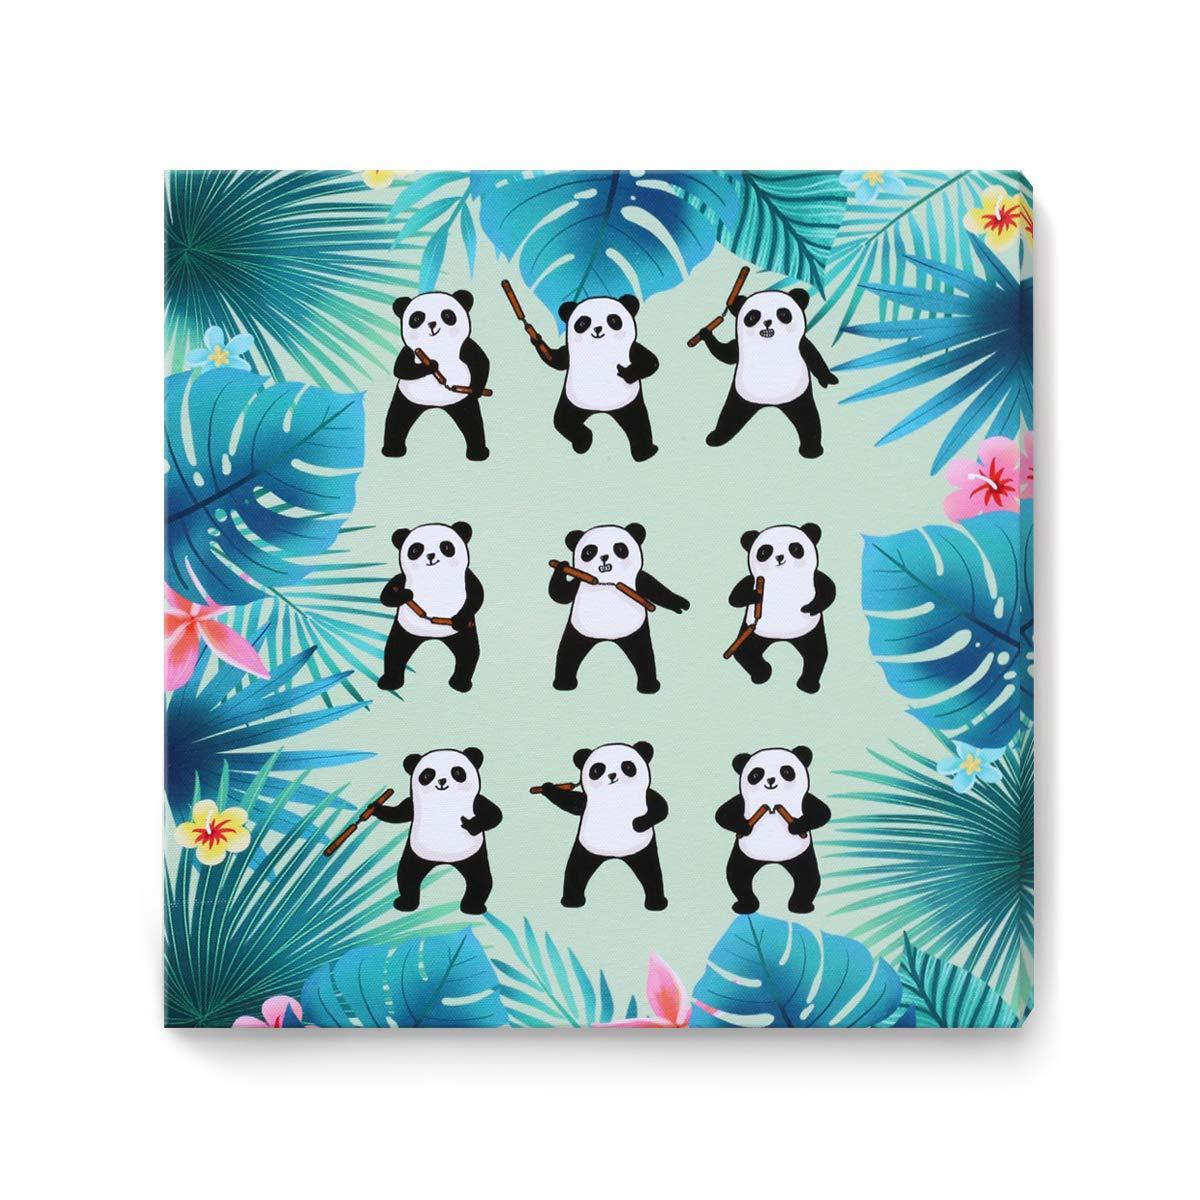 YJY Funny Animals Framed Wall Art Panda Kung Fu Canvas Prints Wall Decoration 12